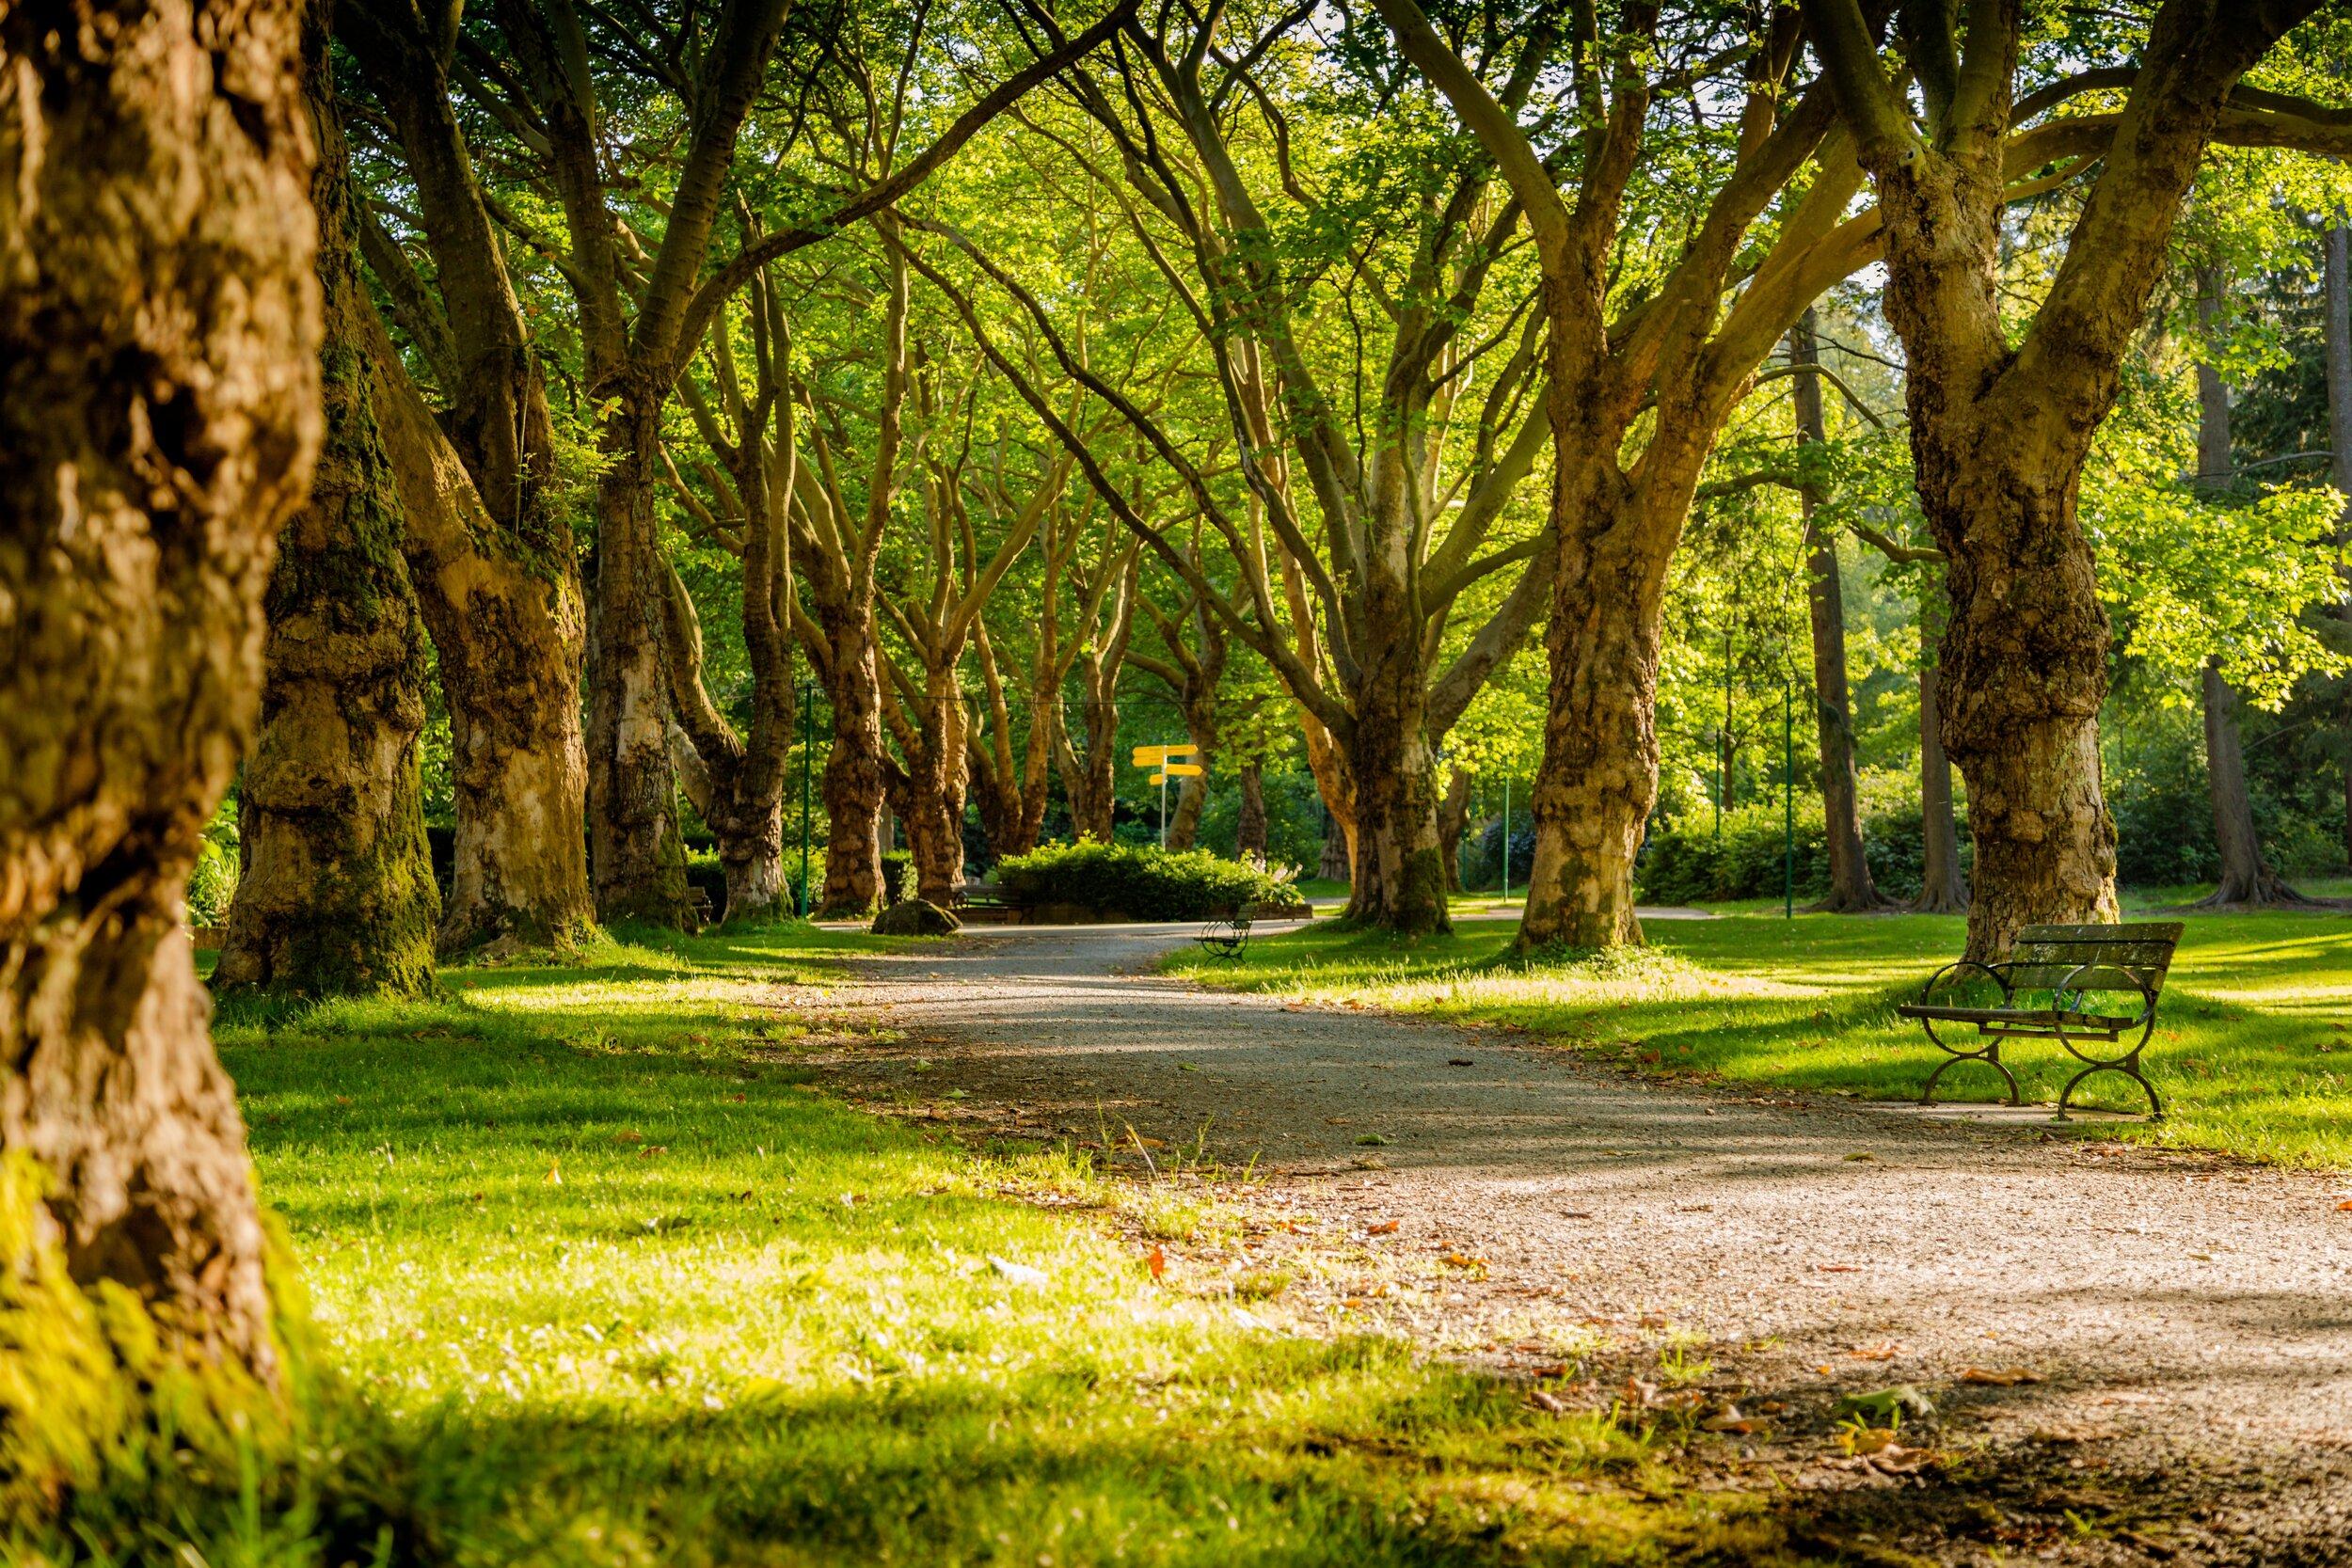 Seagraves Gaines Walking Park